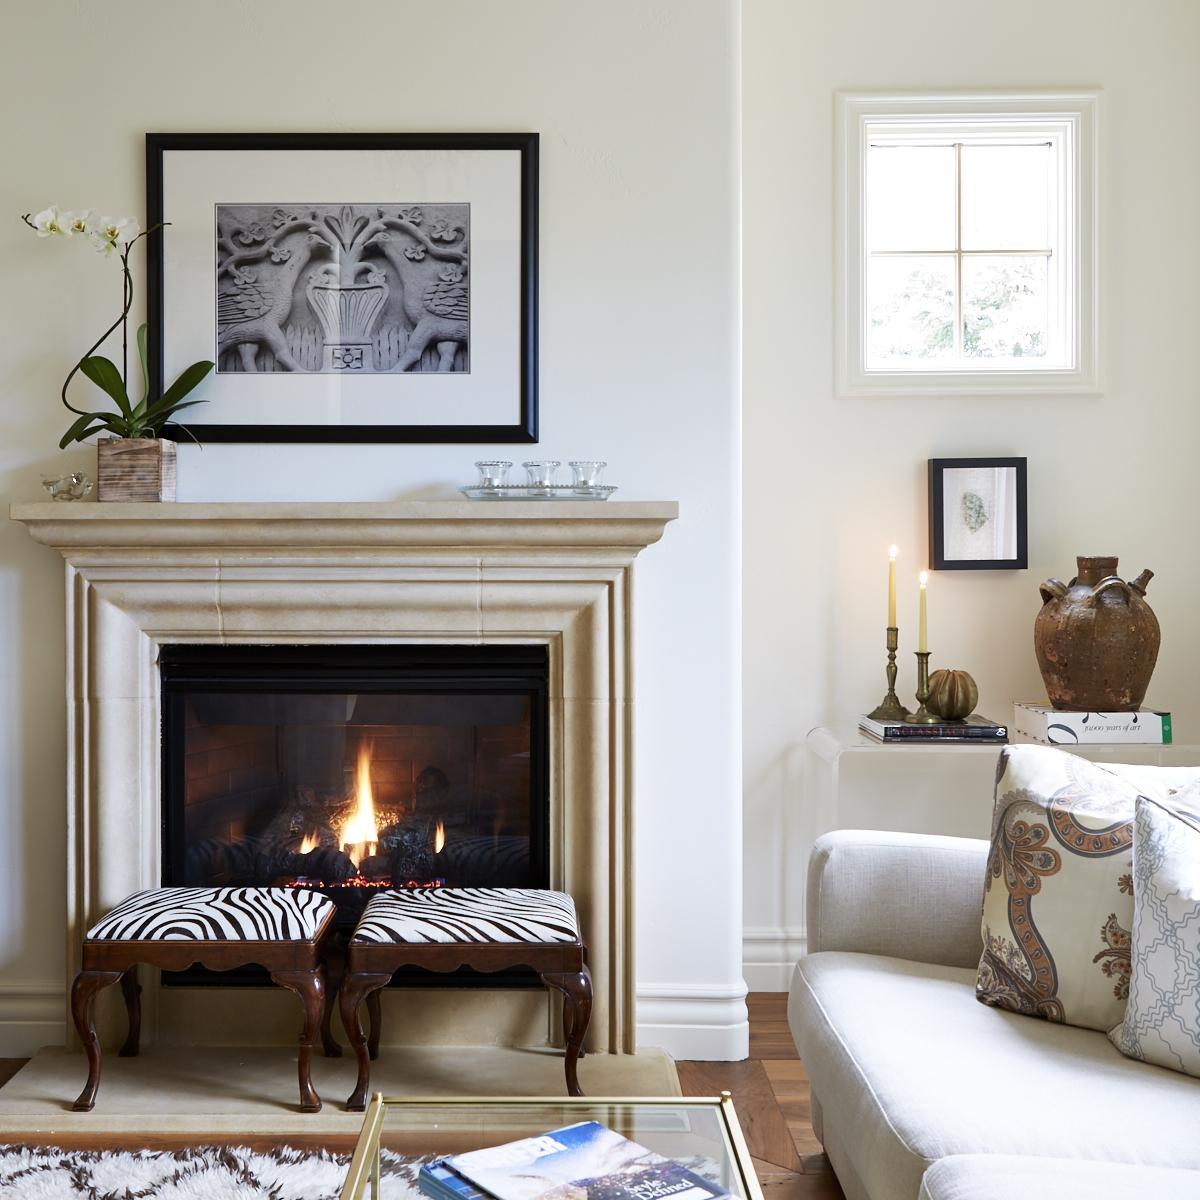 Fireplace-13387.jpg